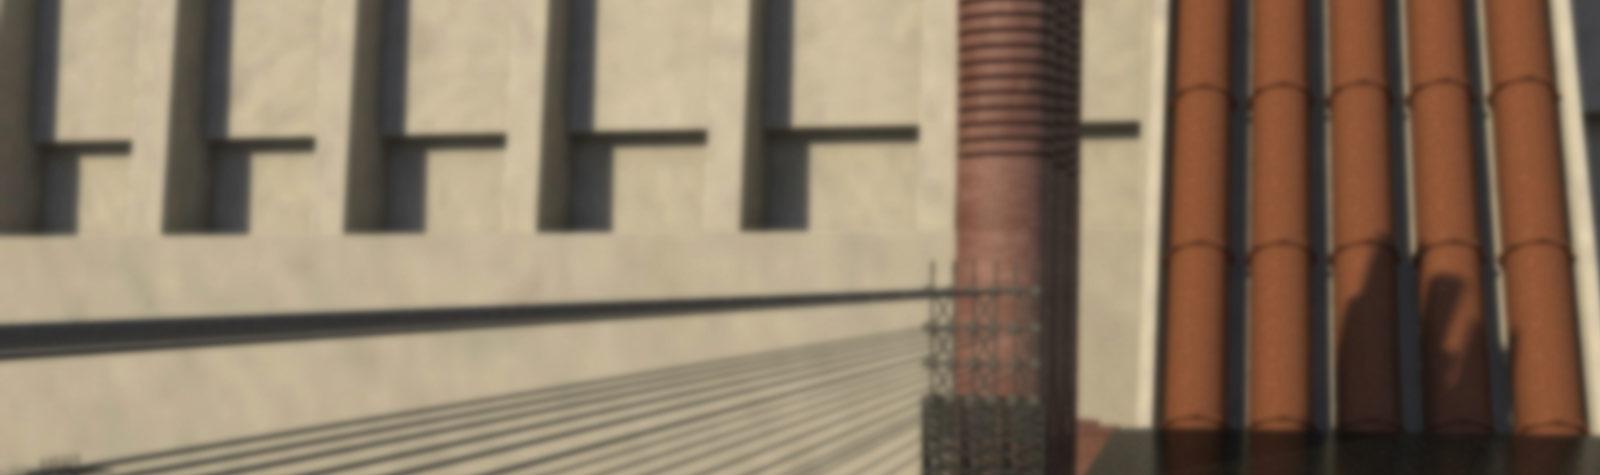 header_studi_architettonici